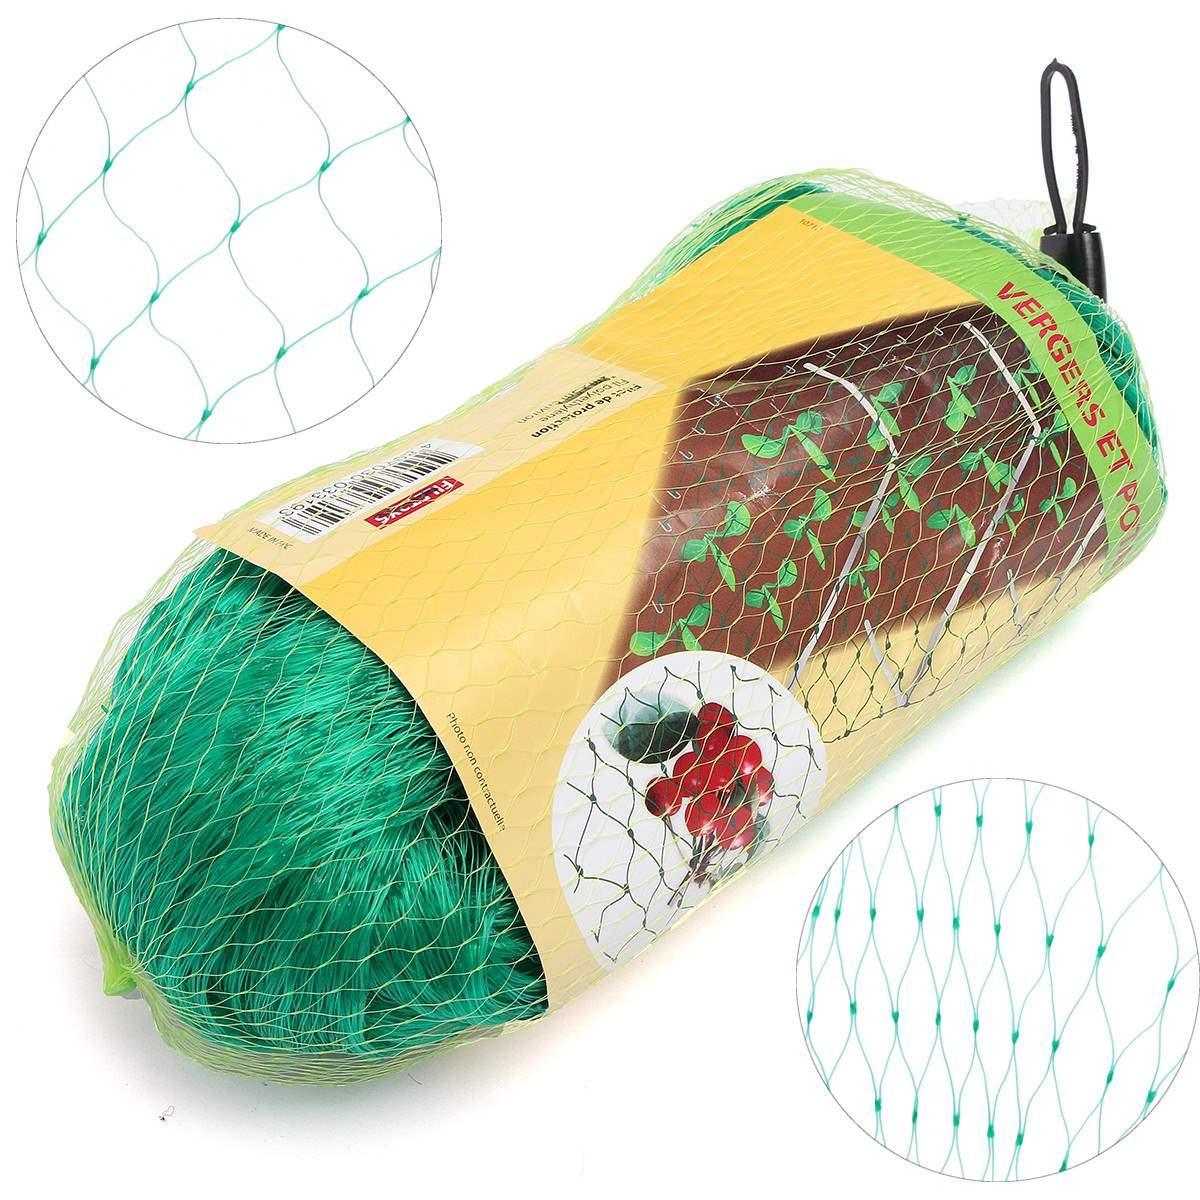 Anti Bird Netting Plastic Pond Fruit Tree Vegetables Net Protection Crops  Flower Garden Mesh Protect Gardening Pest Control 4x6m